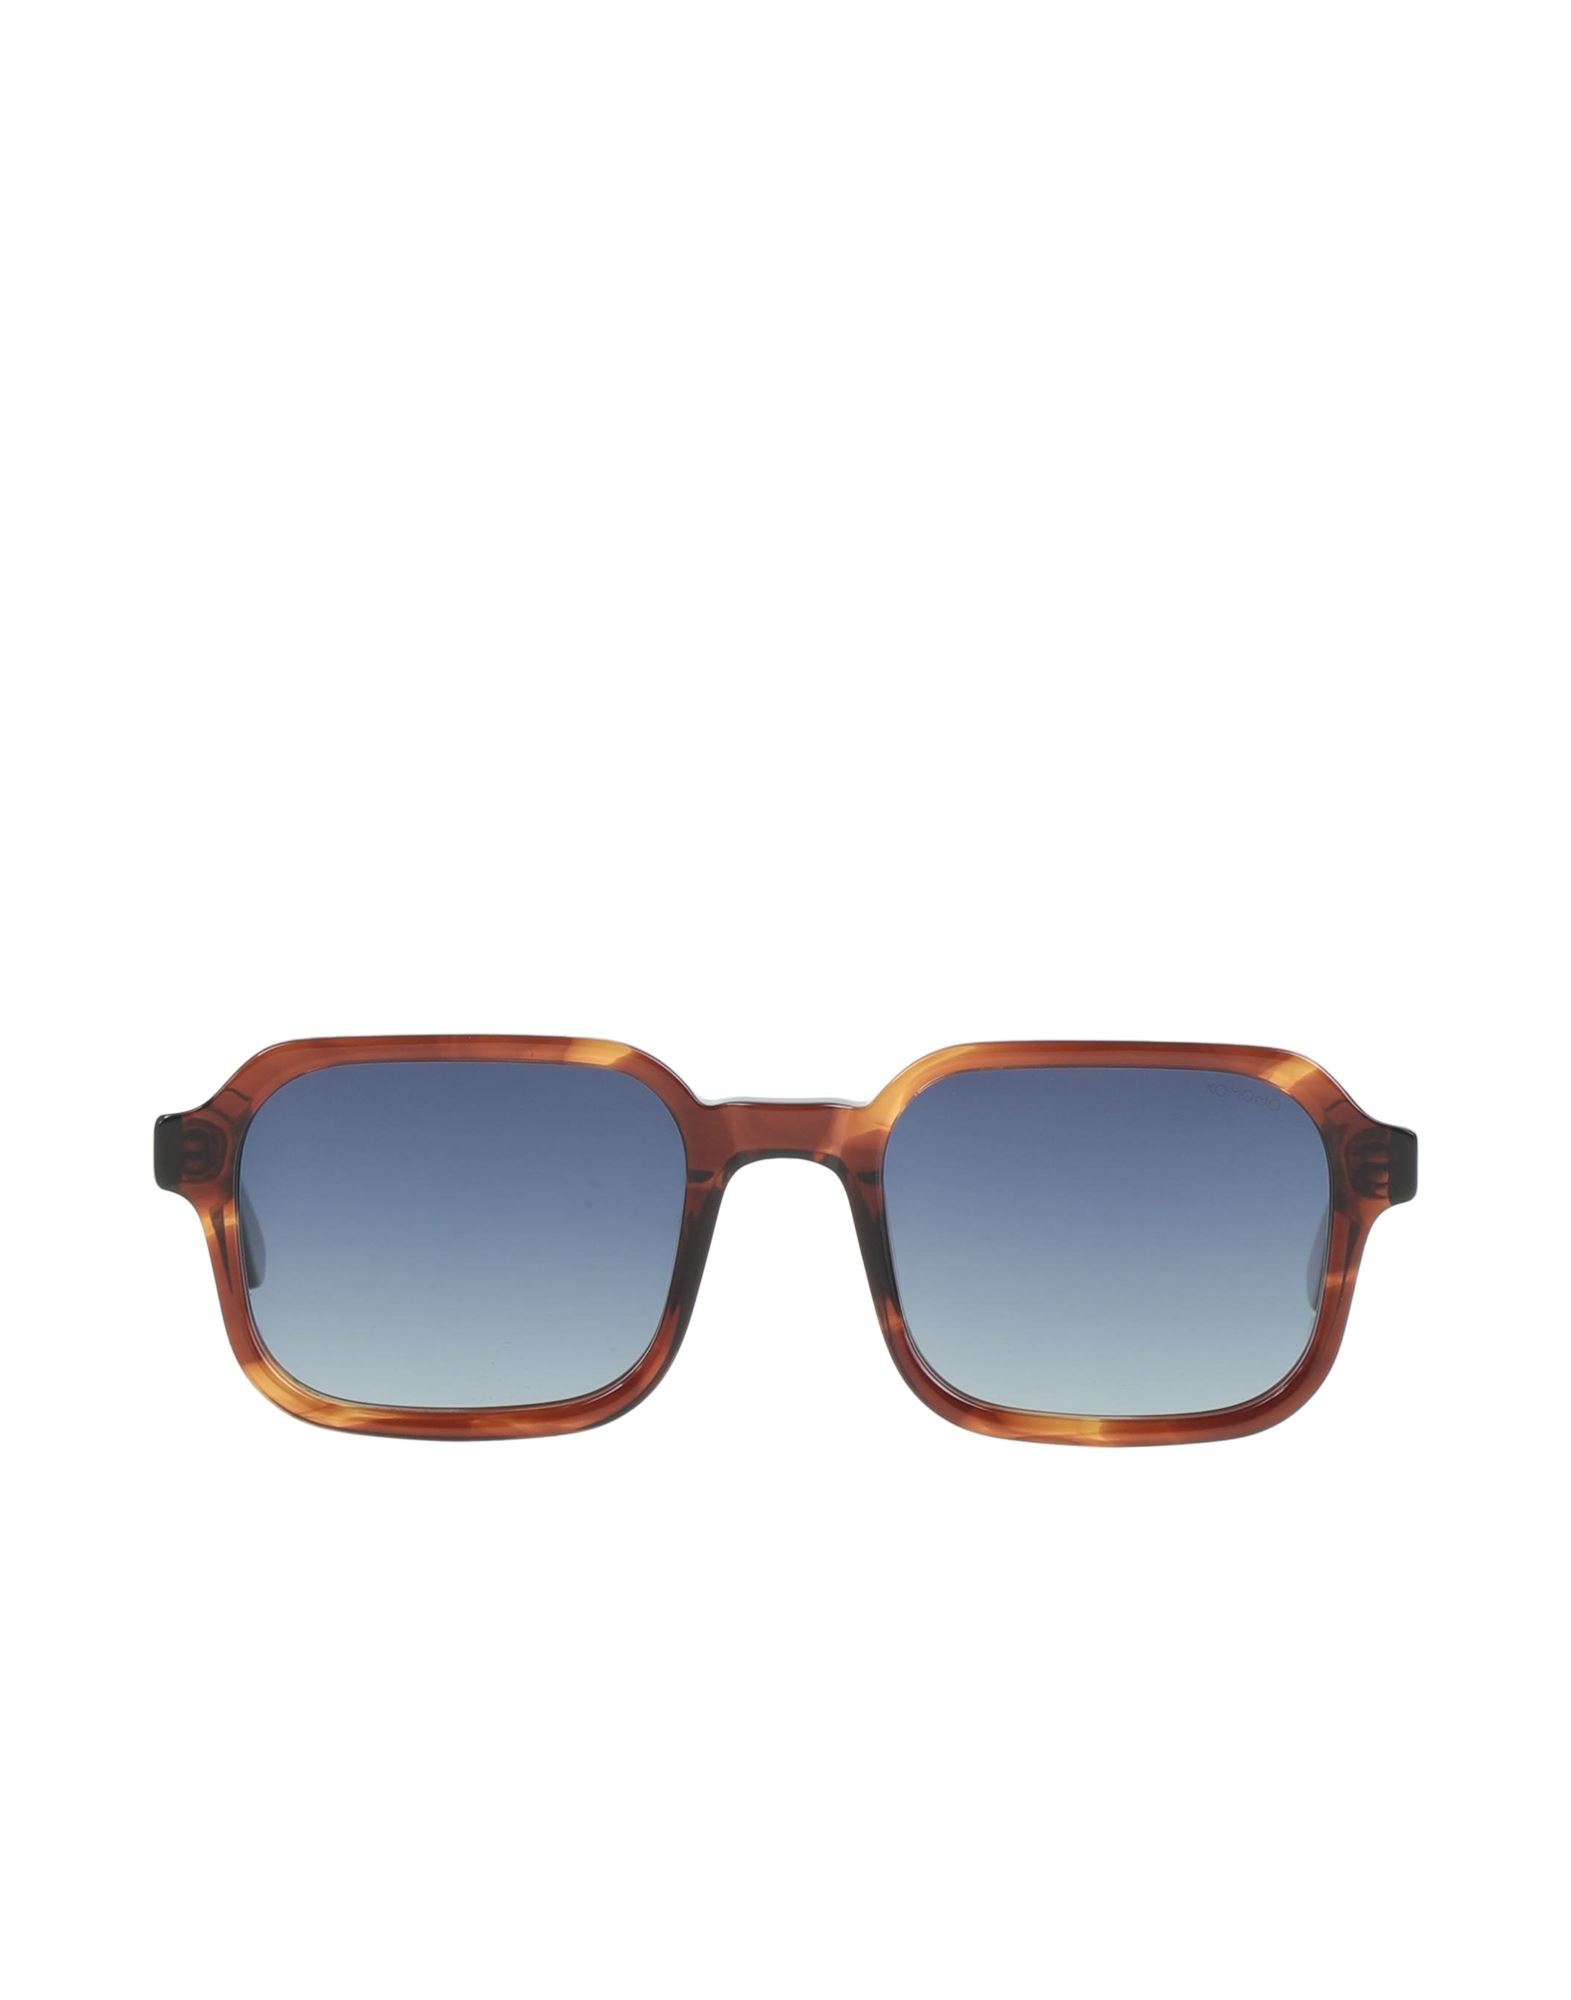 KOMONO Sunglasses - Item 46749824